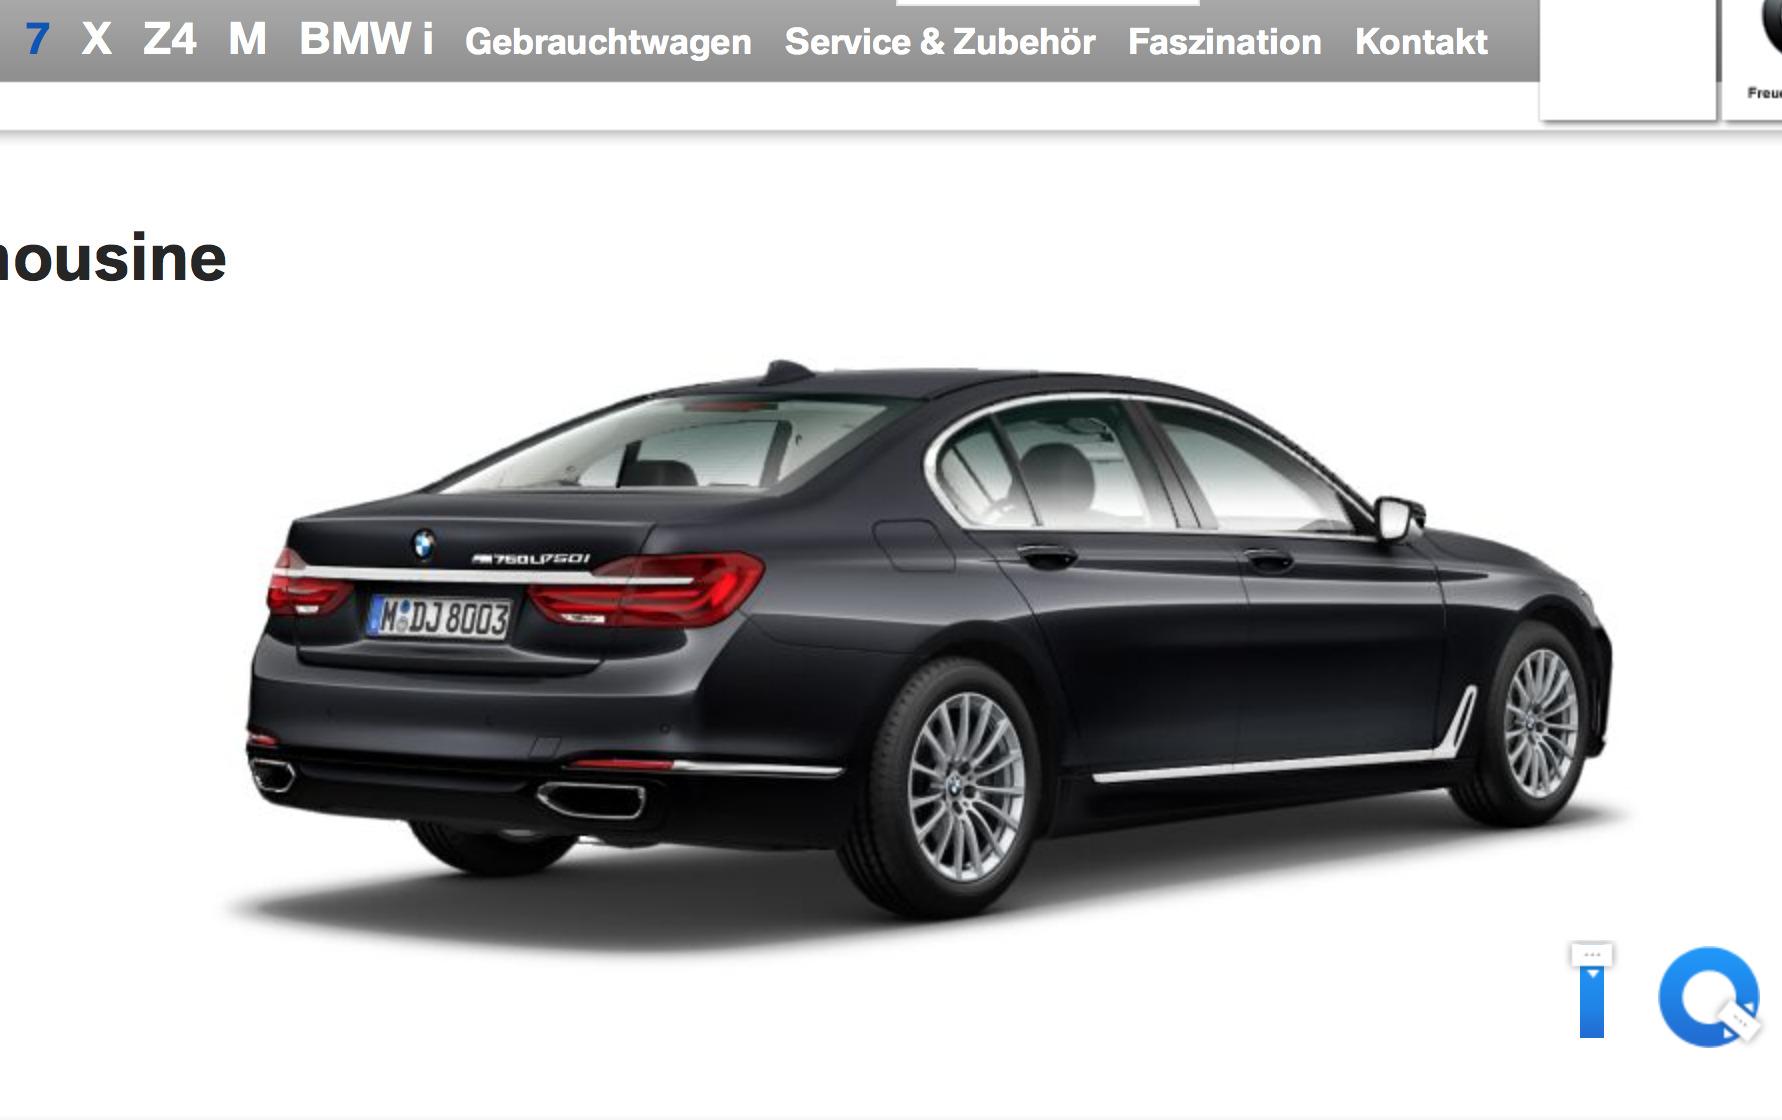 2016 BMW M760Li 2